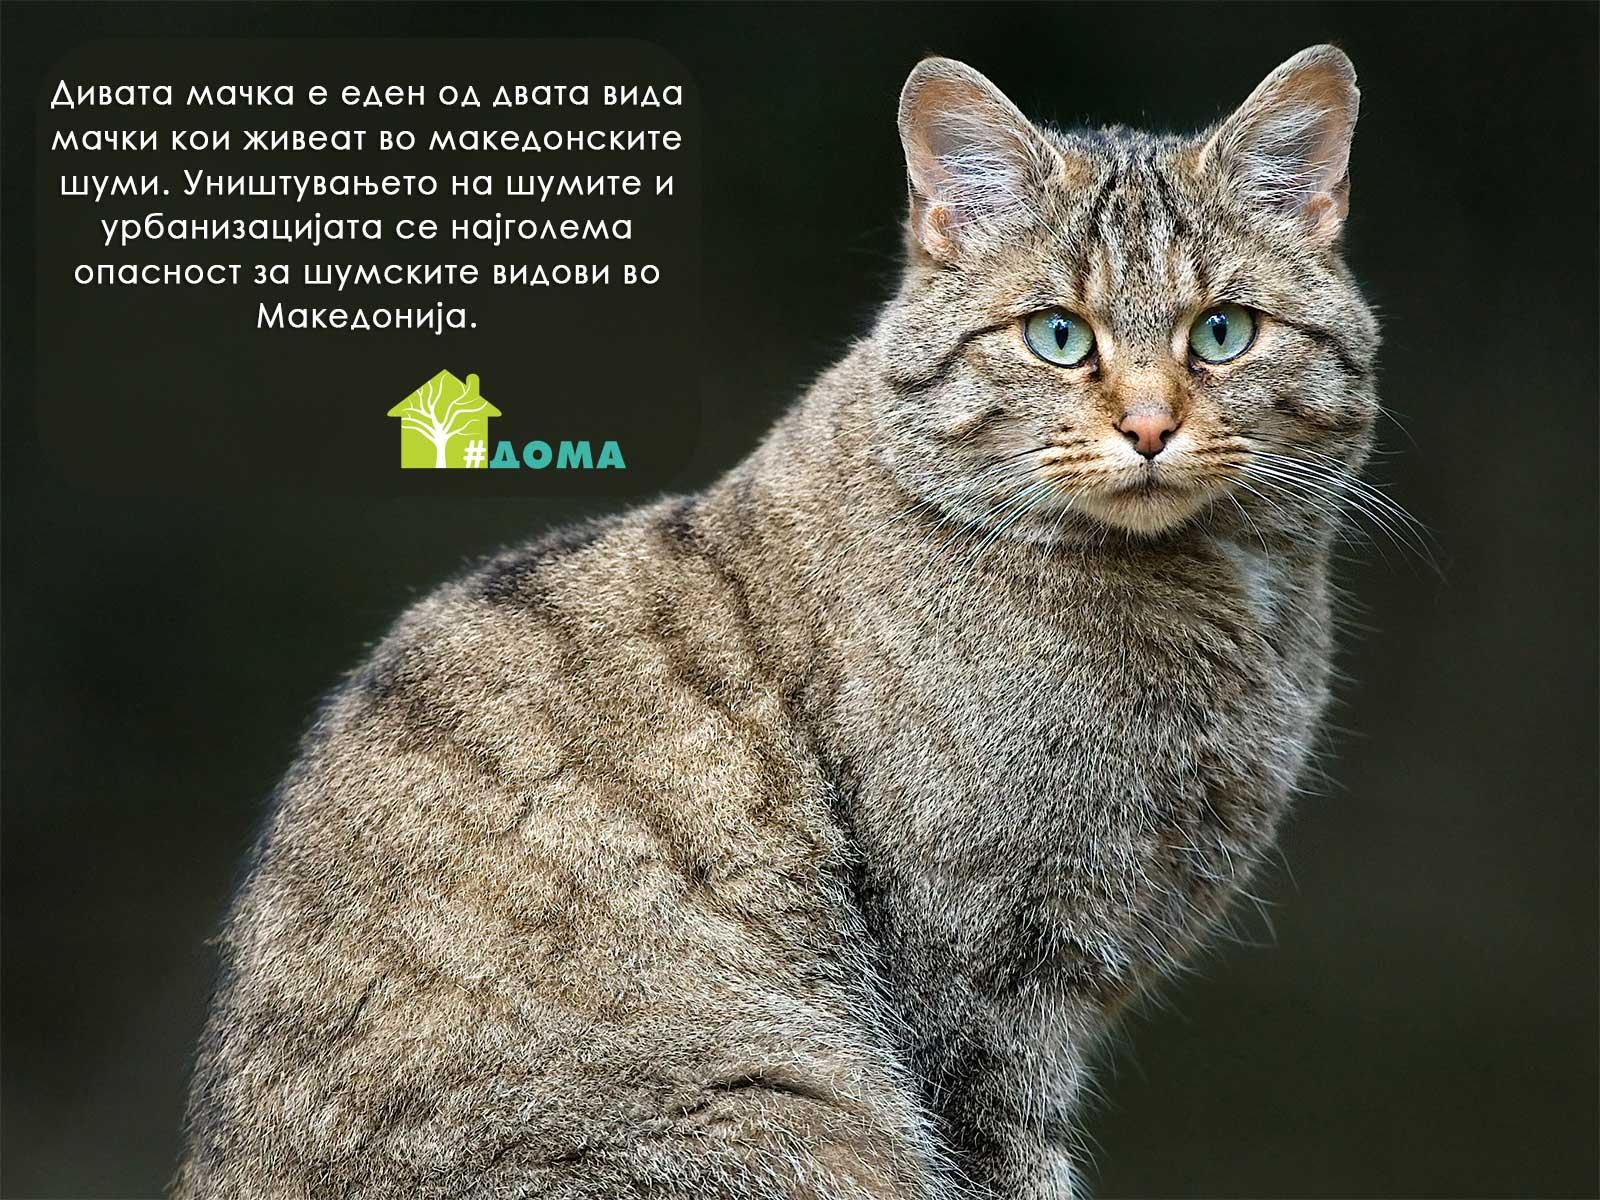 Diva macka Zastita na divite macki vo Makedonija